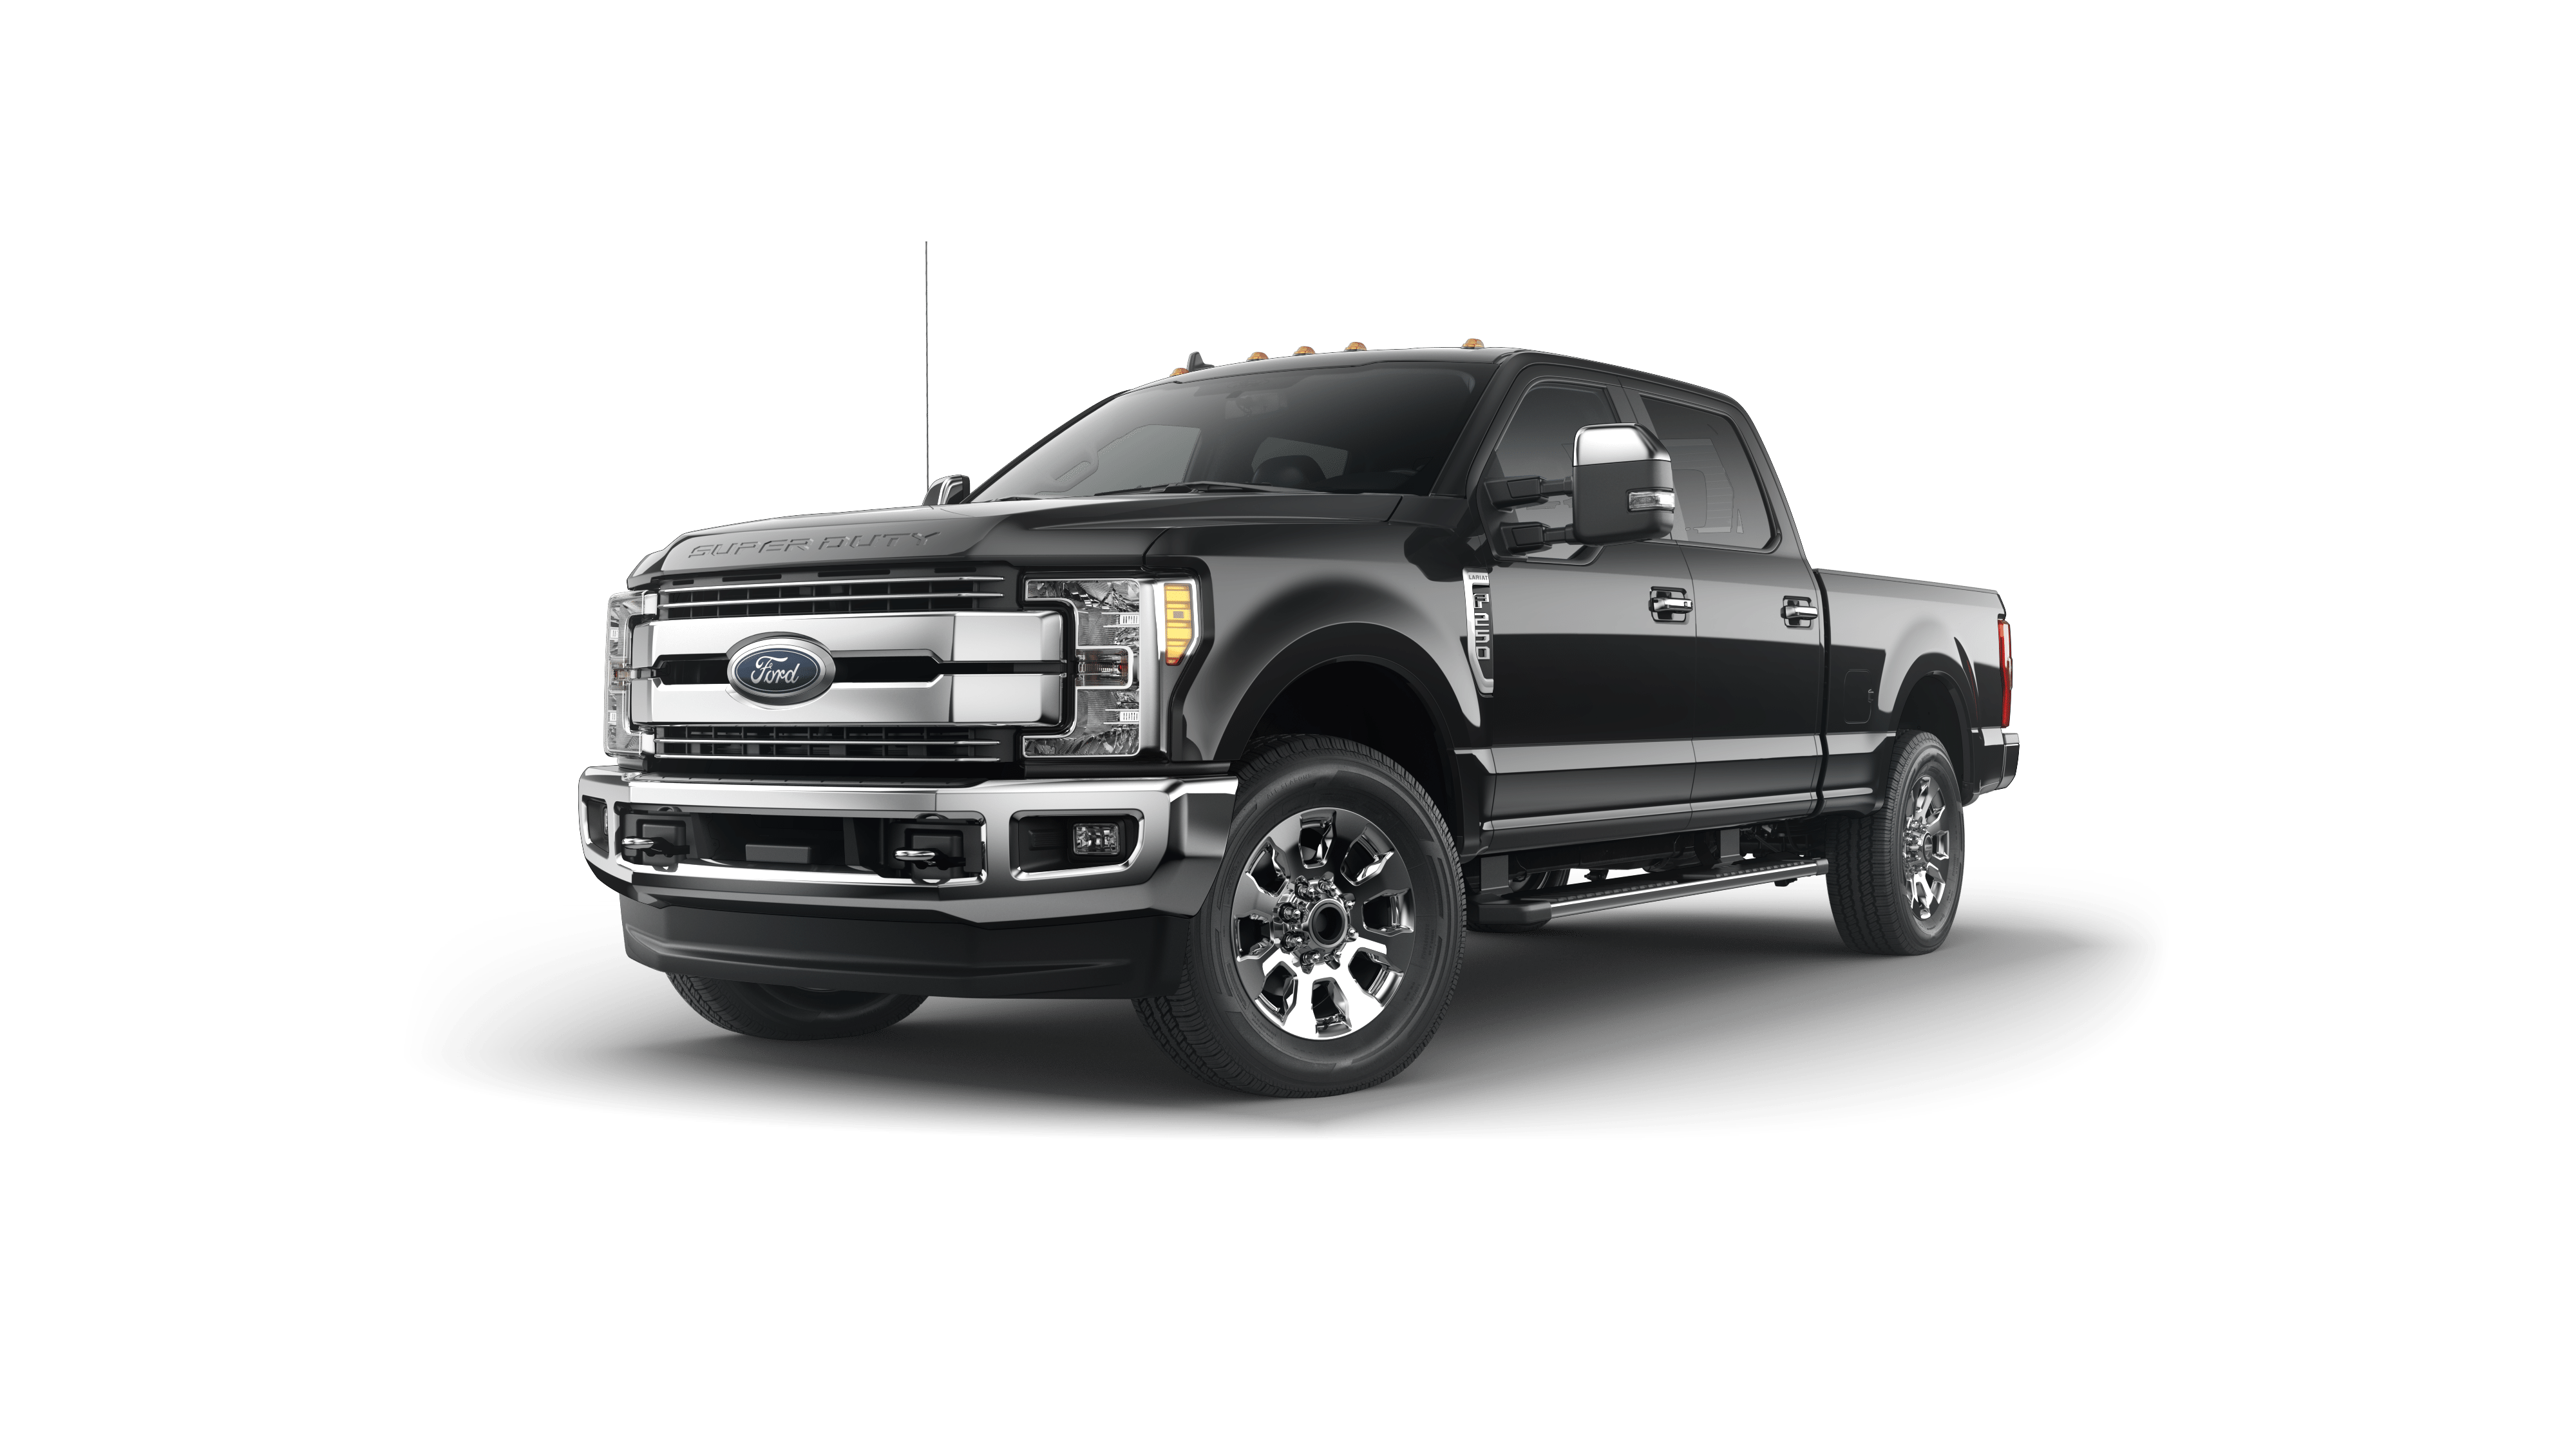 2019 Ford Super Duty F